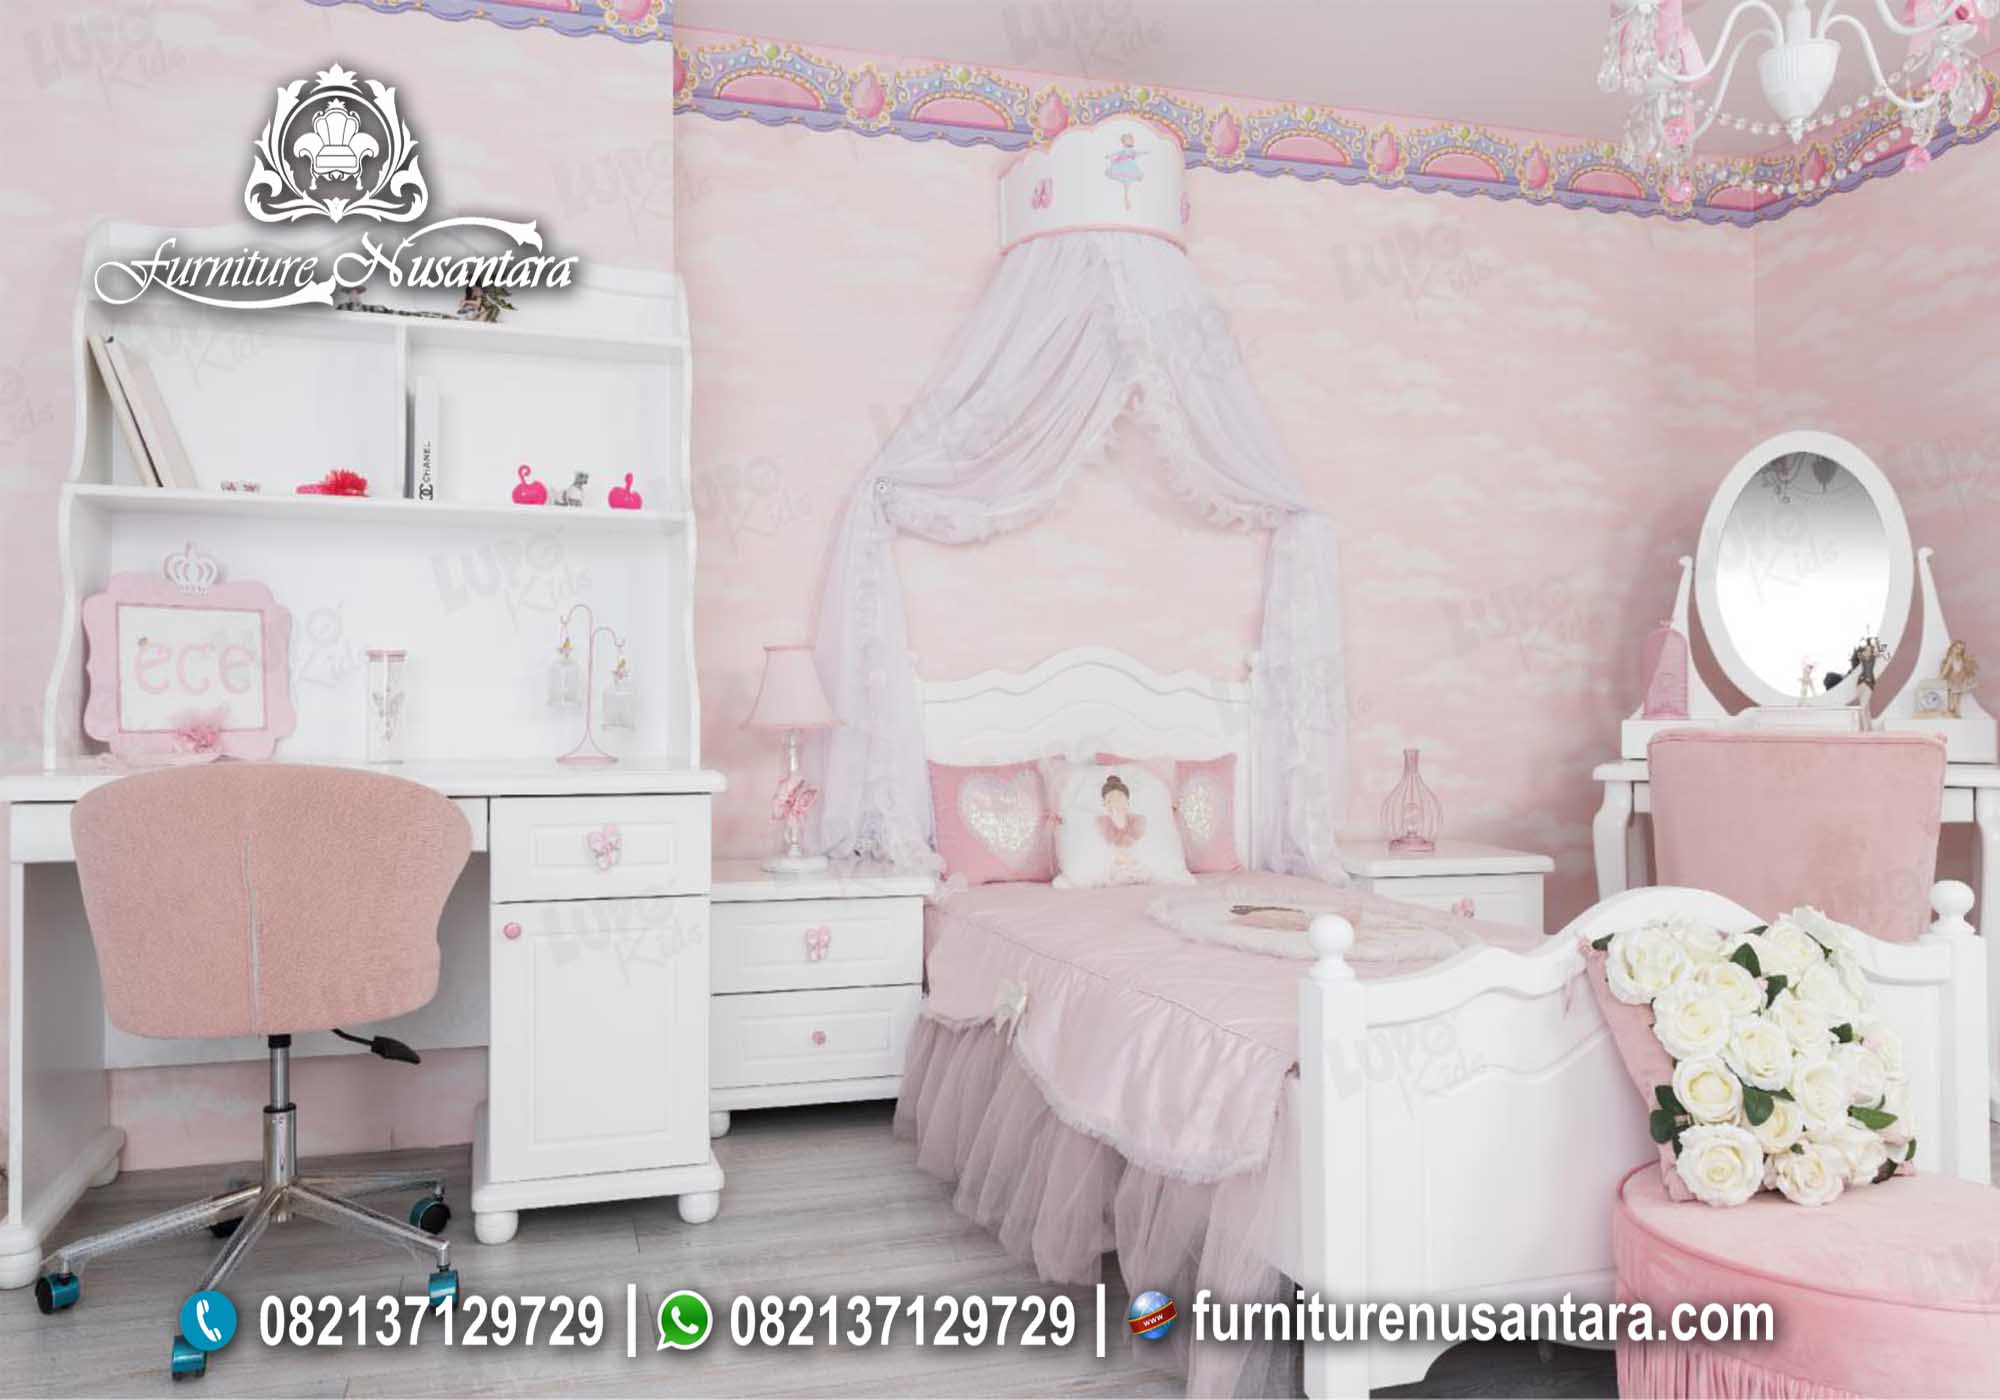 Dekorasi Kamar Anak Minimalis Lucu Elegan KA-01, Furniture Nusantara